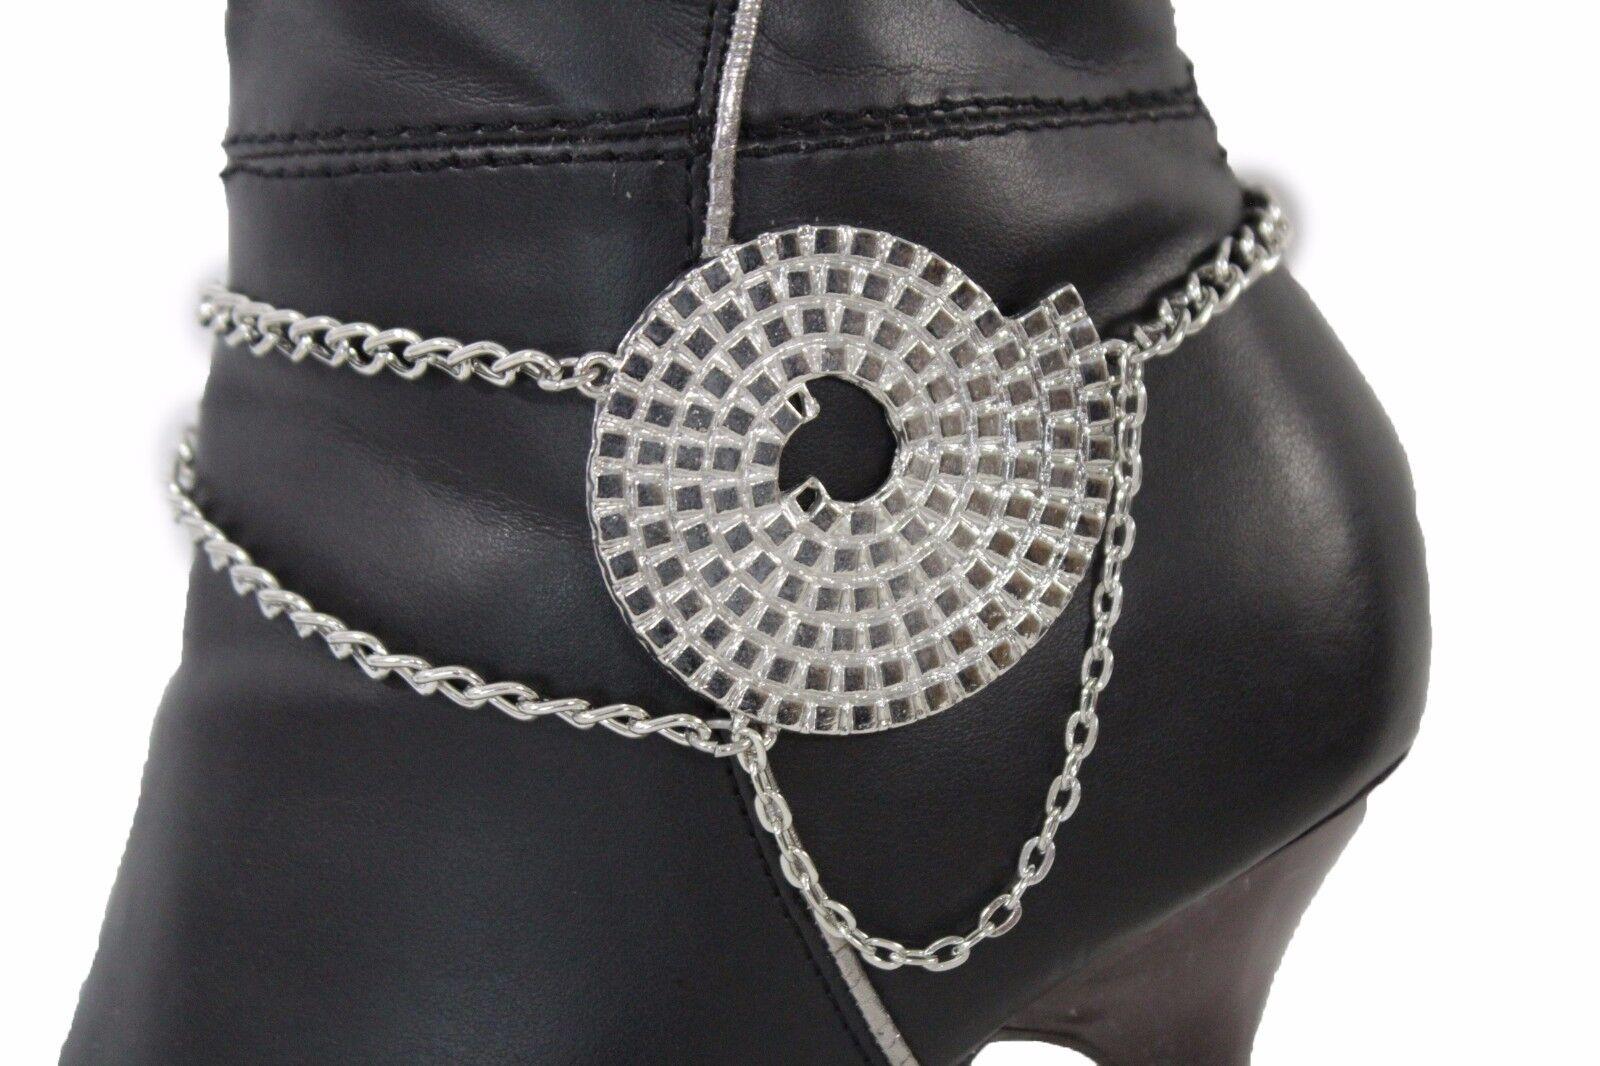 New Women Boot Bracelet Silver Metal Chain Anklet Fashion Shoe Swirl Charm Bling